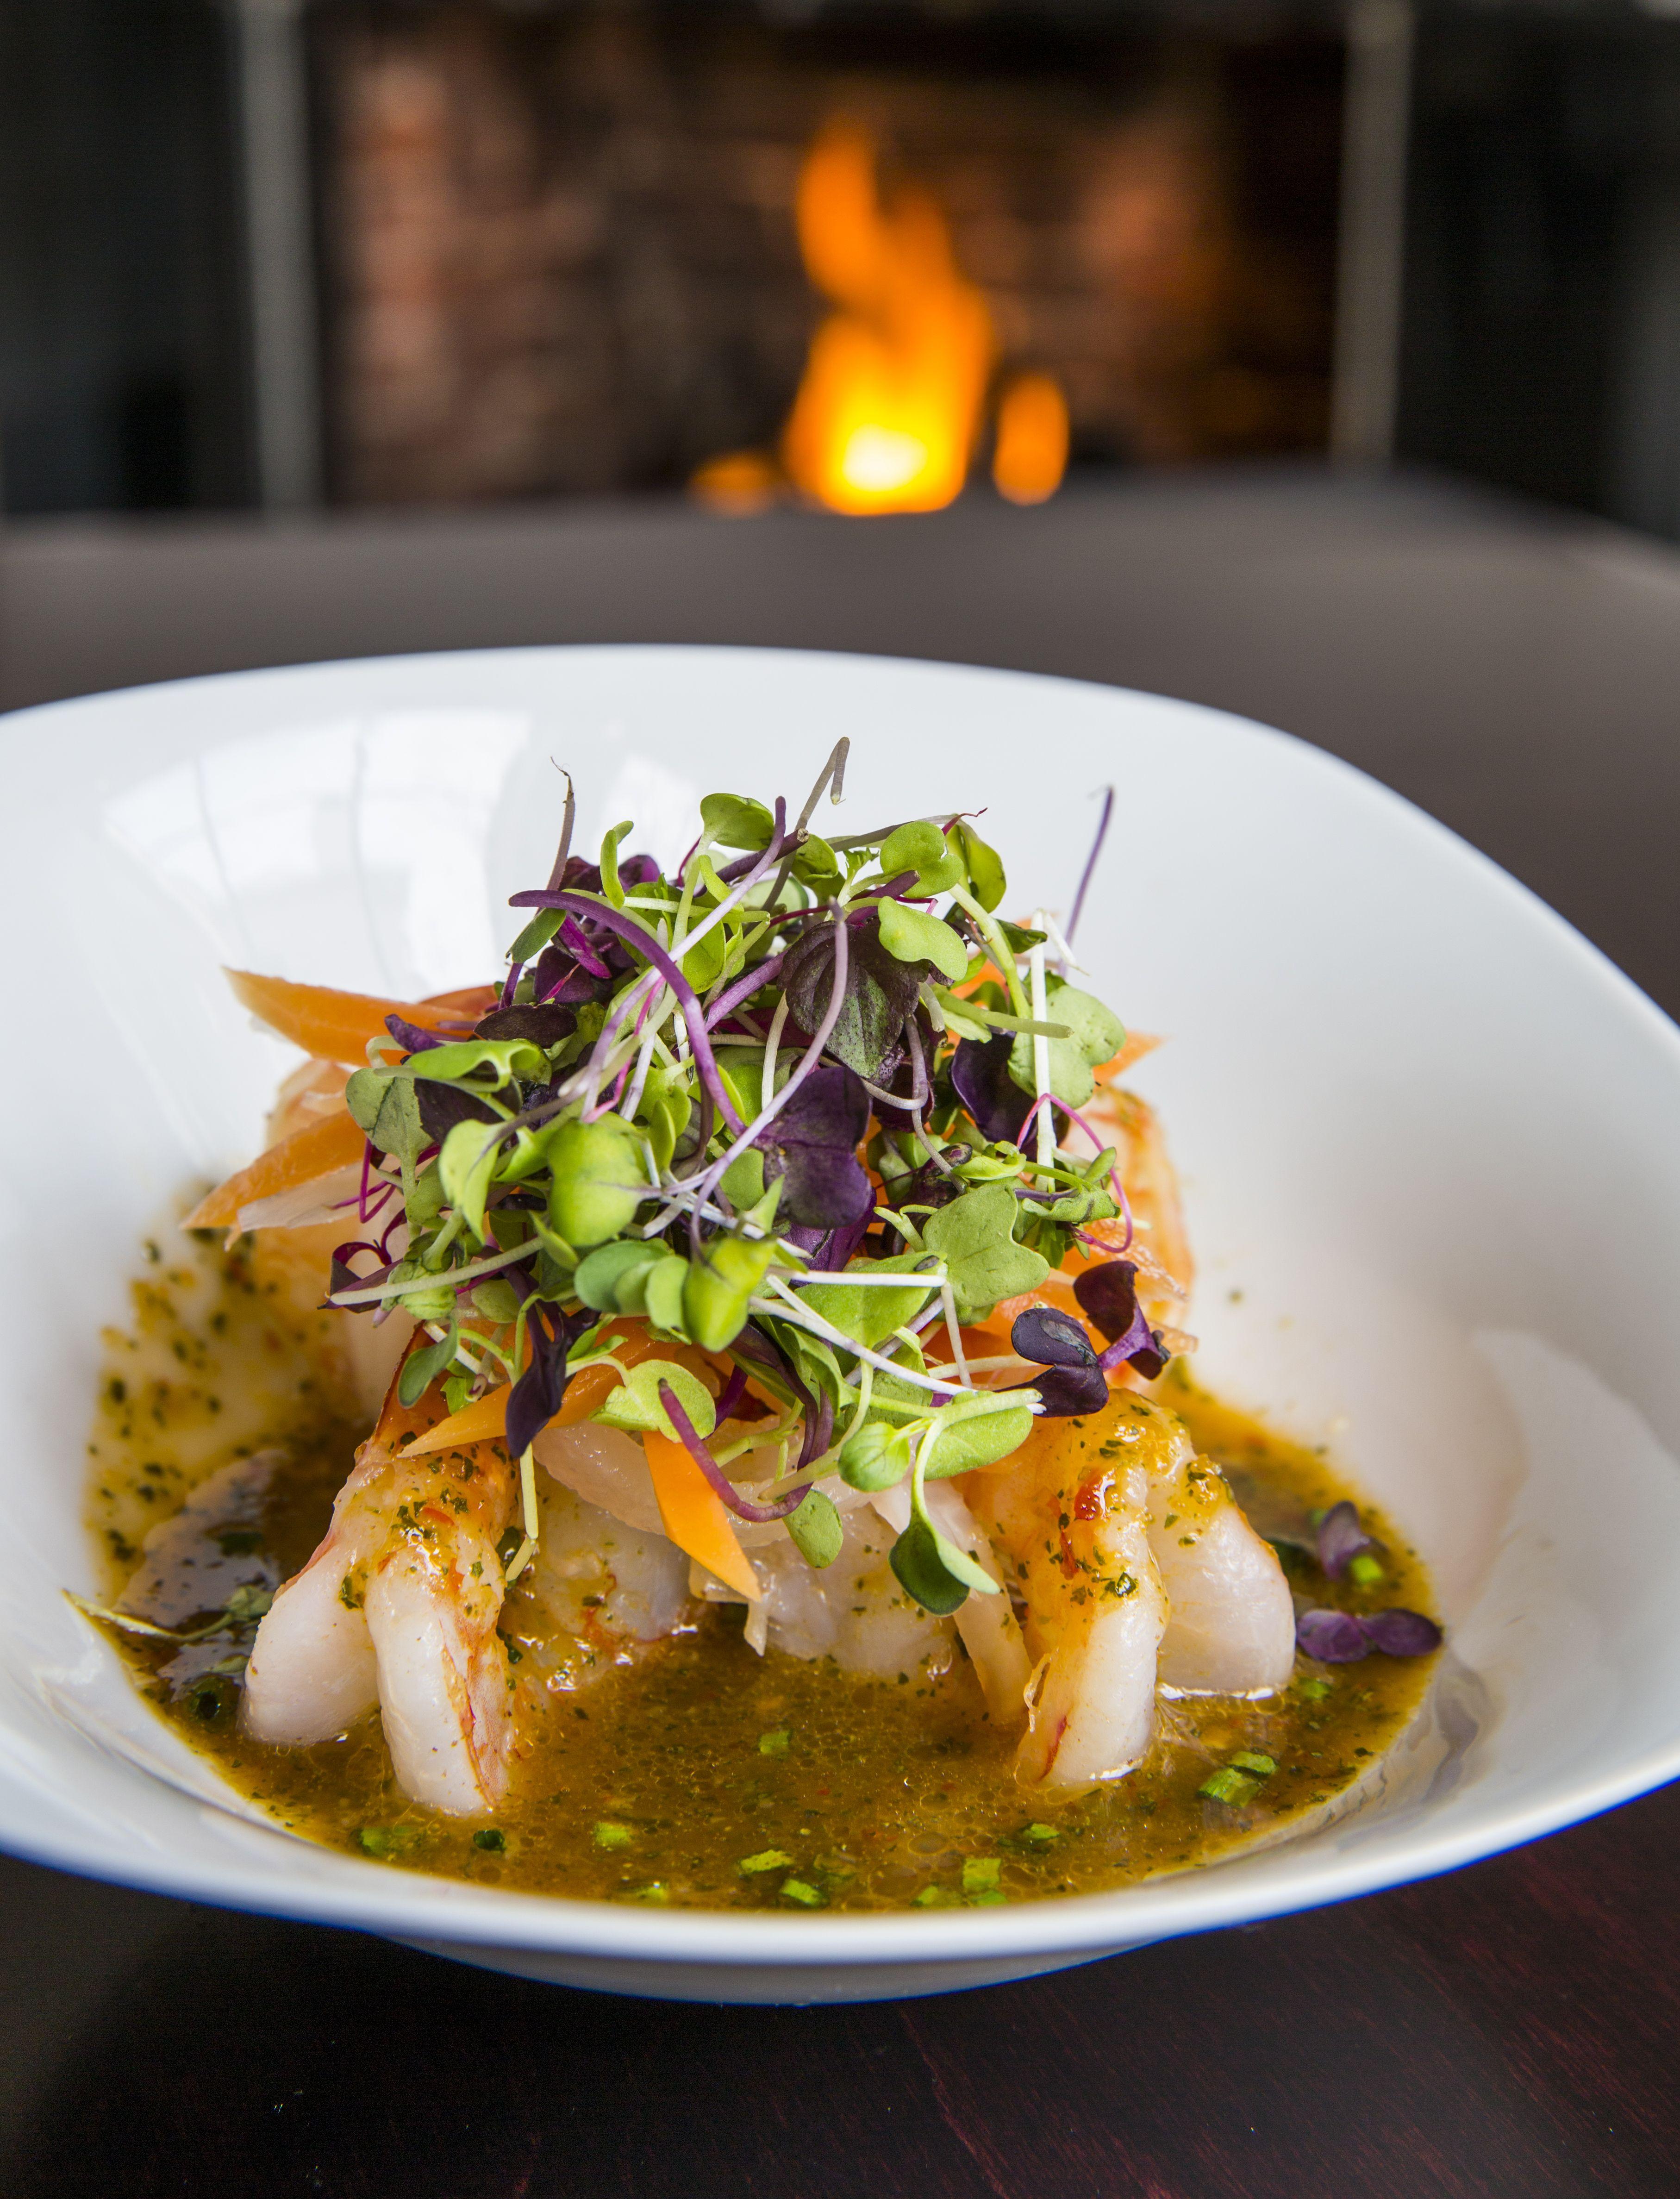 Pan Seared Jumbo Shrimp from Chatham Wine Bar & Restaurant #newenglandeats #chathamwinebar